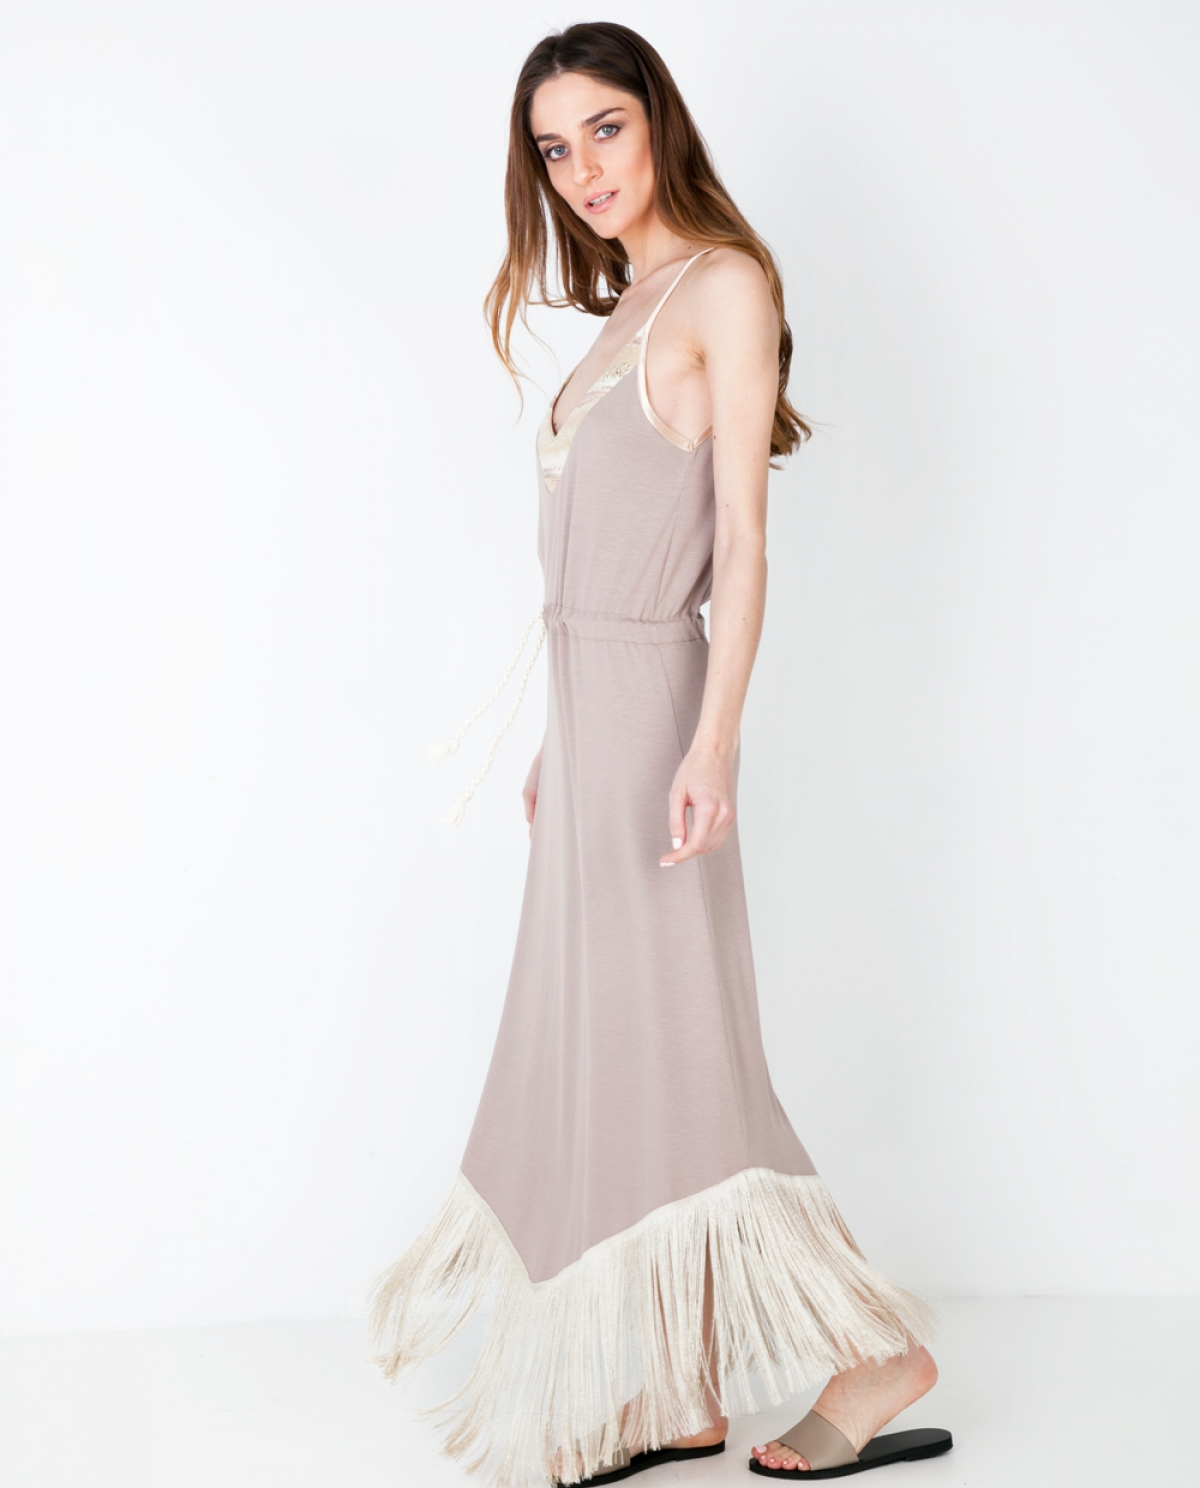 Jersey Fringed Maxi Dress - Fashionnoiz